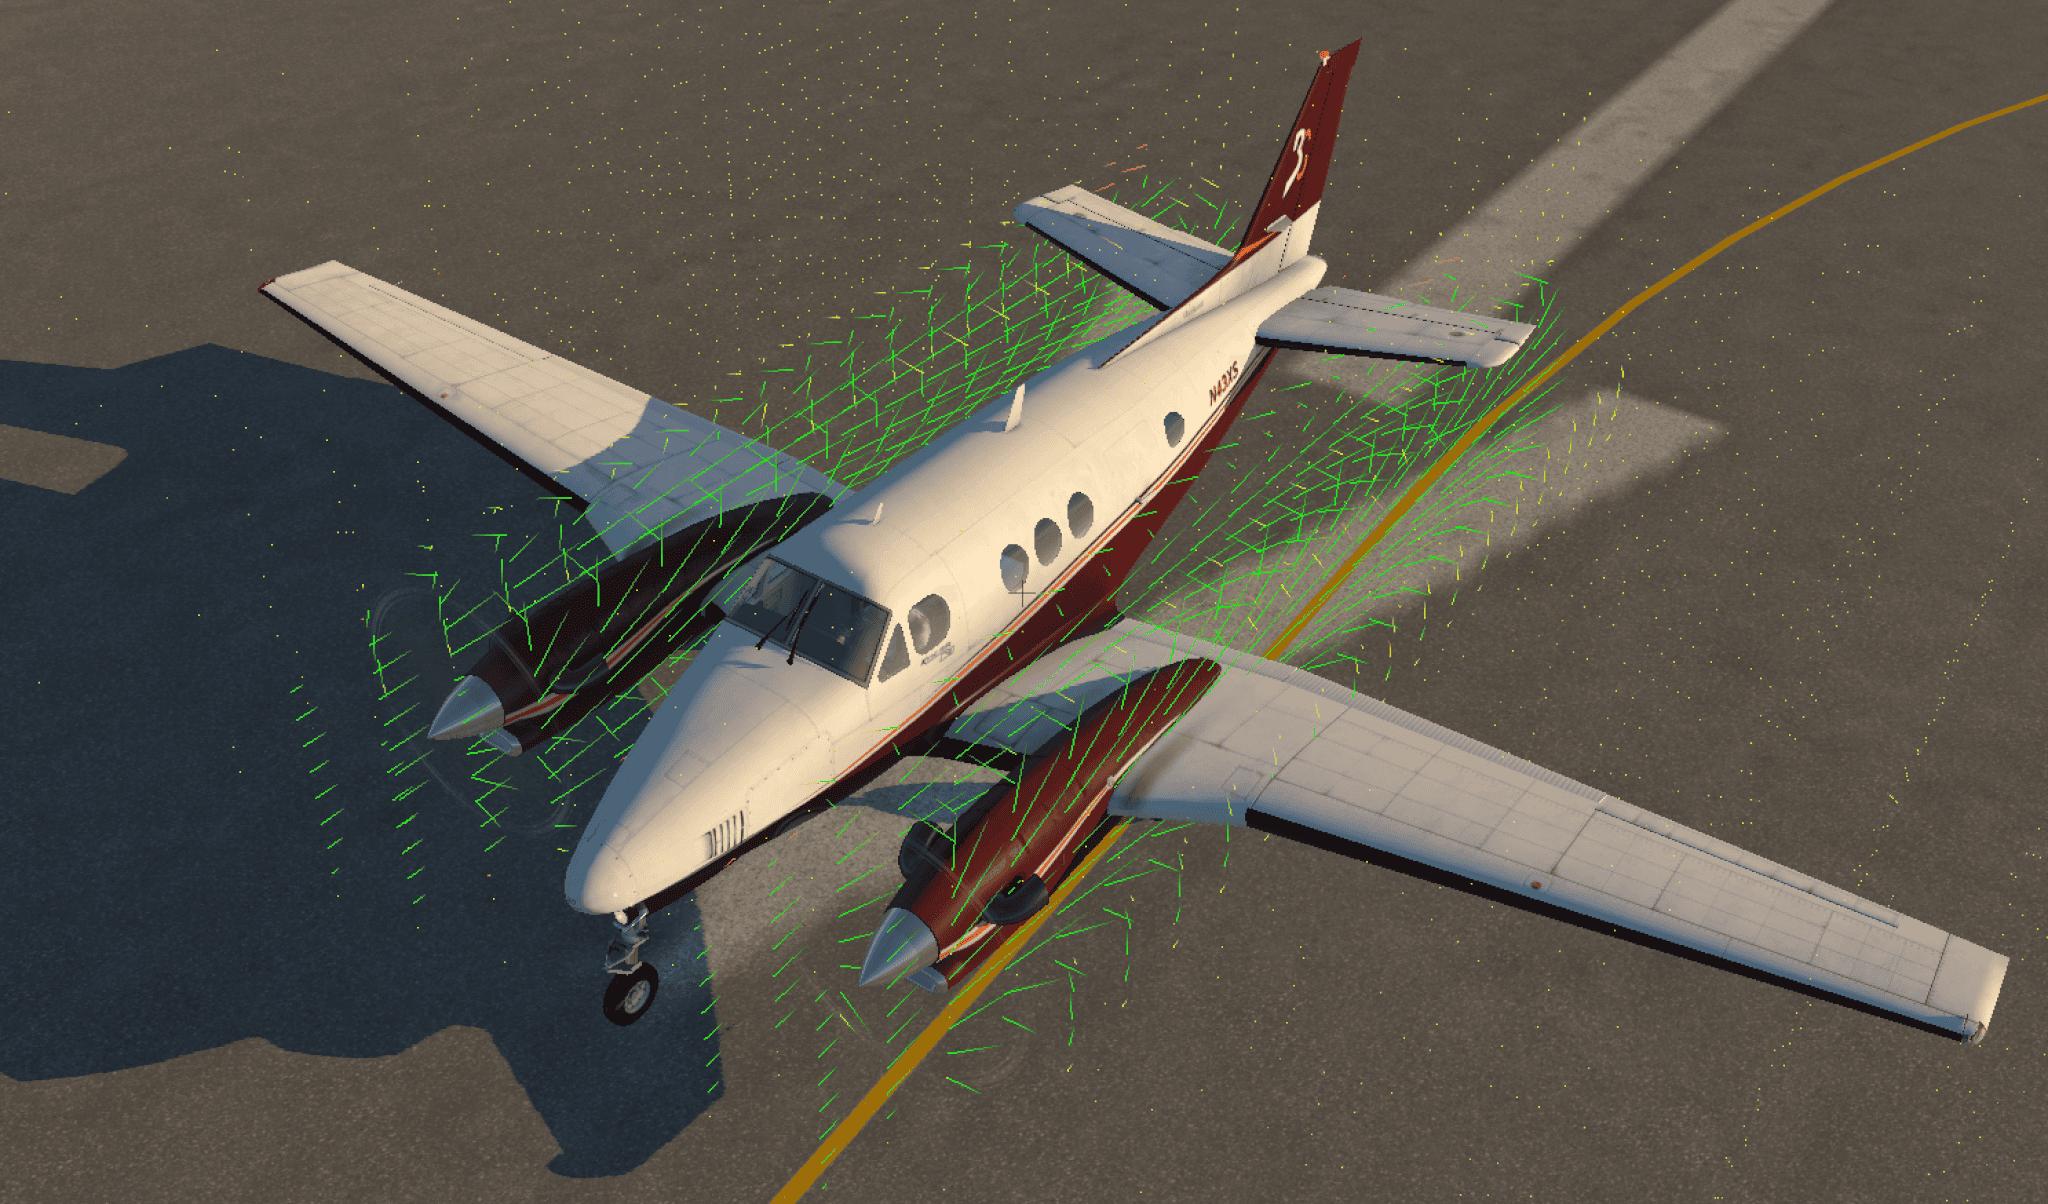 X Plane 1130 prop FM